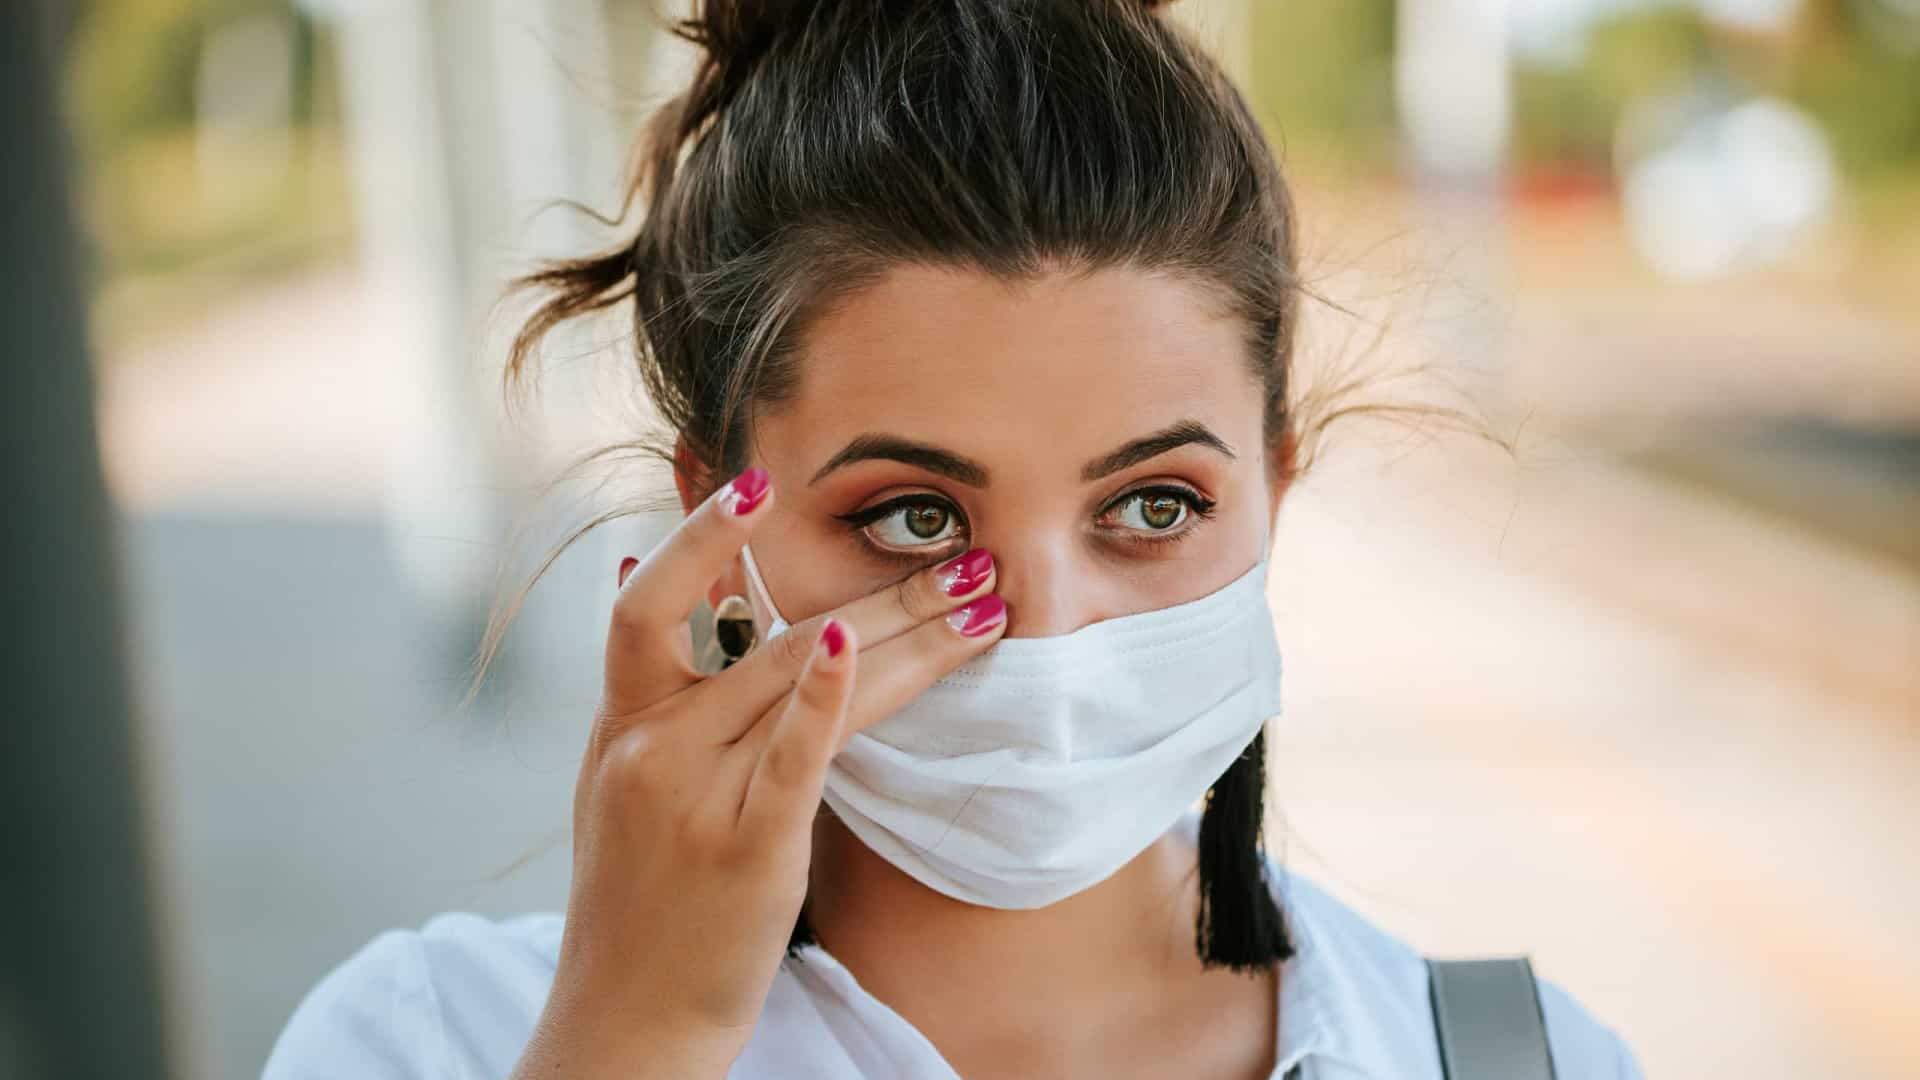 Coronavírus. É possível contrair Covid-19 através dos olhos?